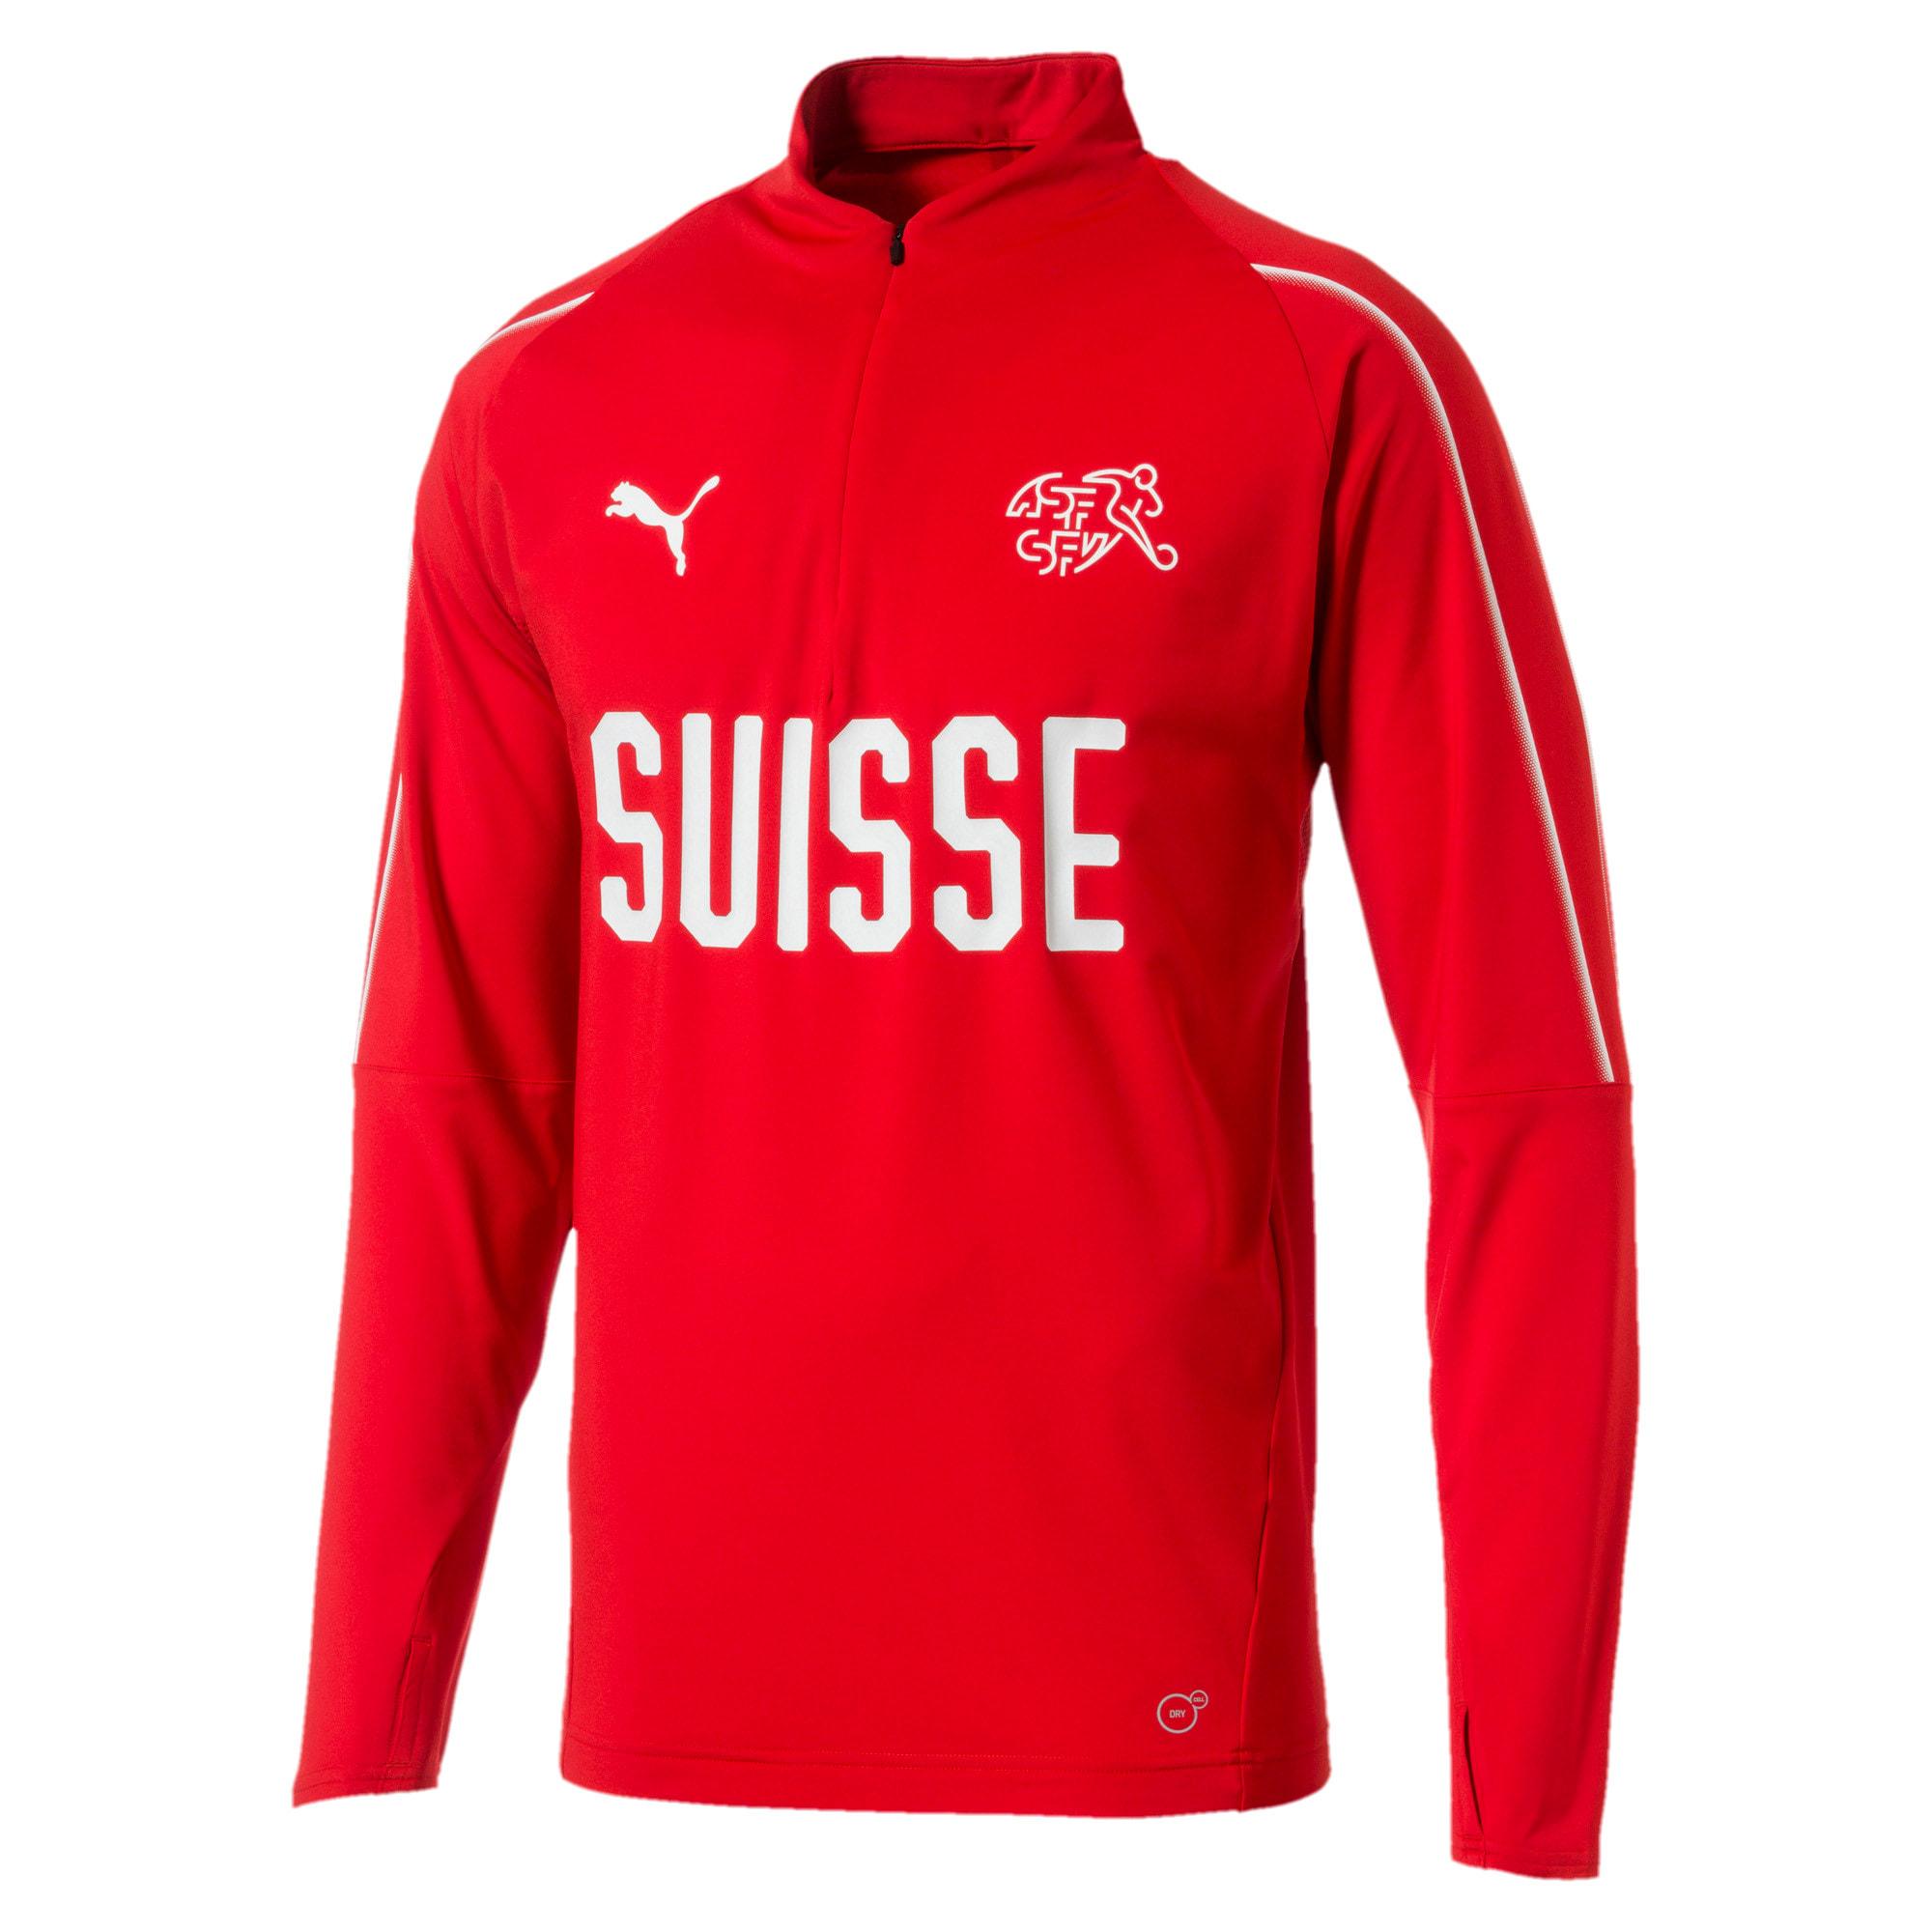 Thumbnail 1 of Trainingstop van Zwitserland met korte rits, Puma Red-Puma White, medium